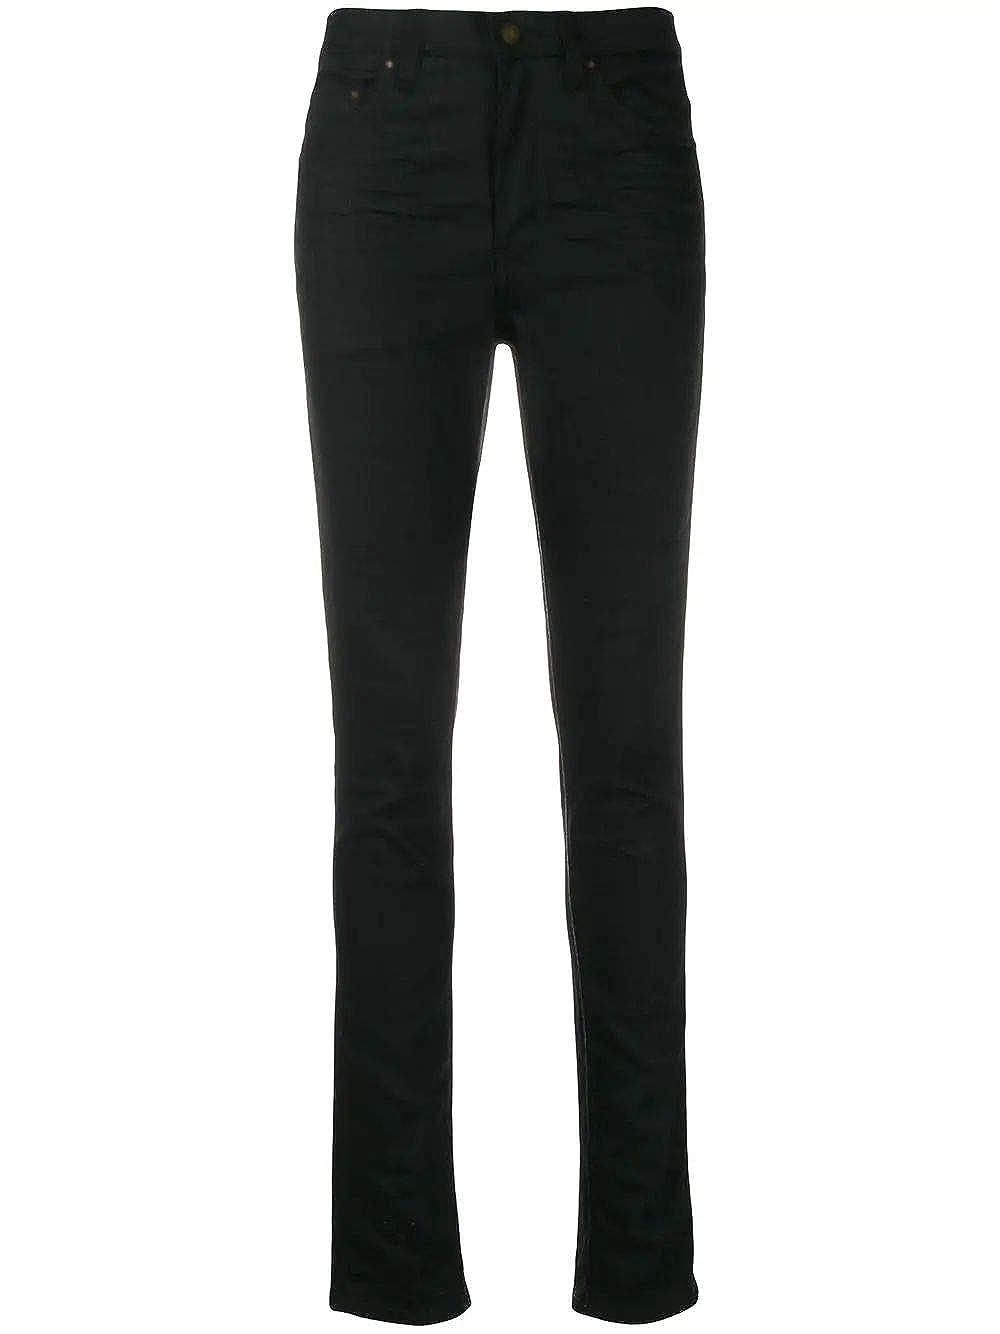 Saint Laurent Luxury Fashion Womens 527379YO5001080 Black Jeans | Season Permanent